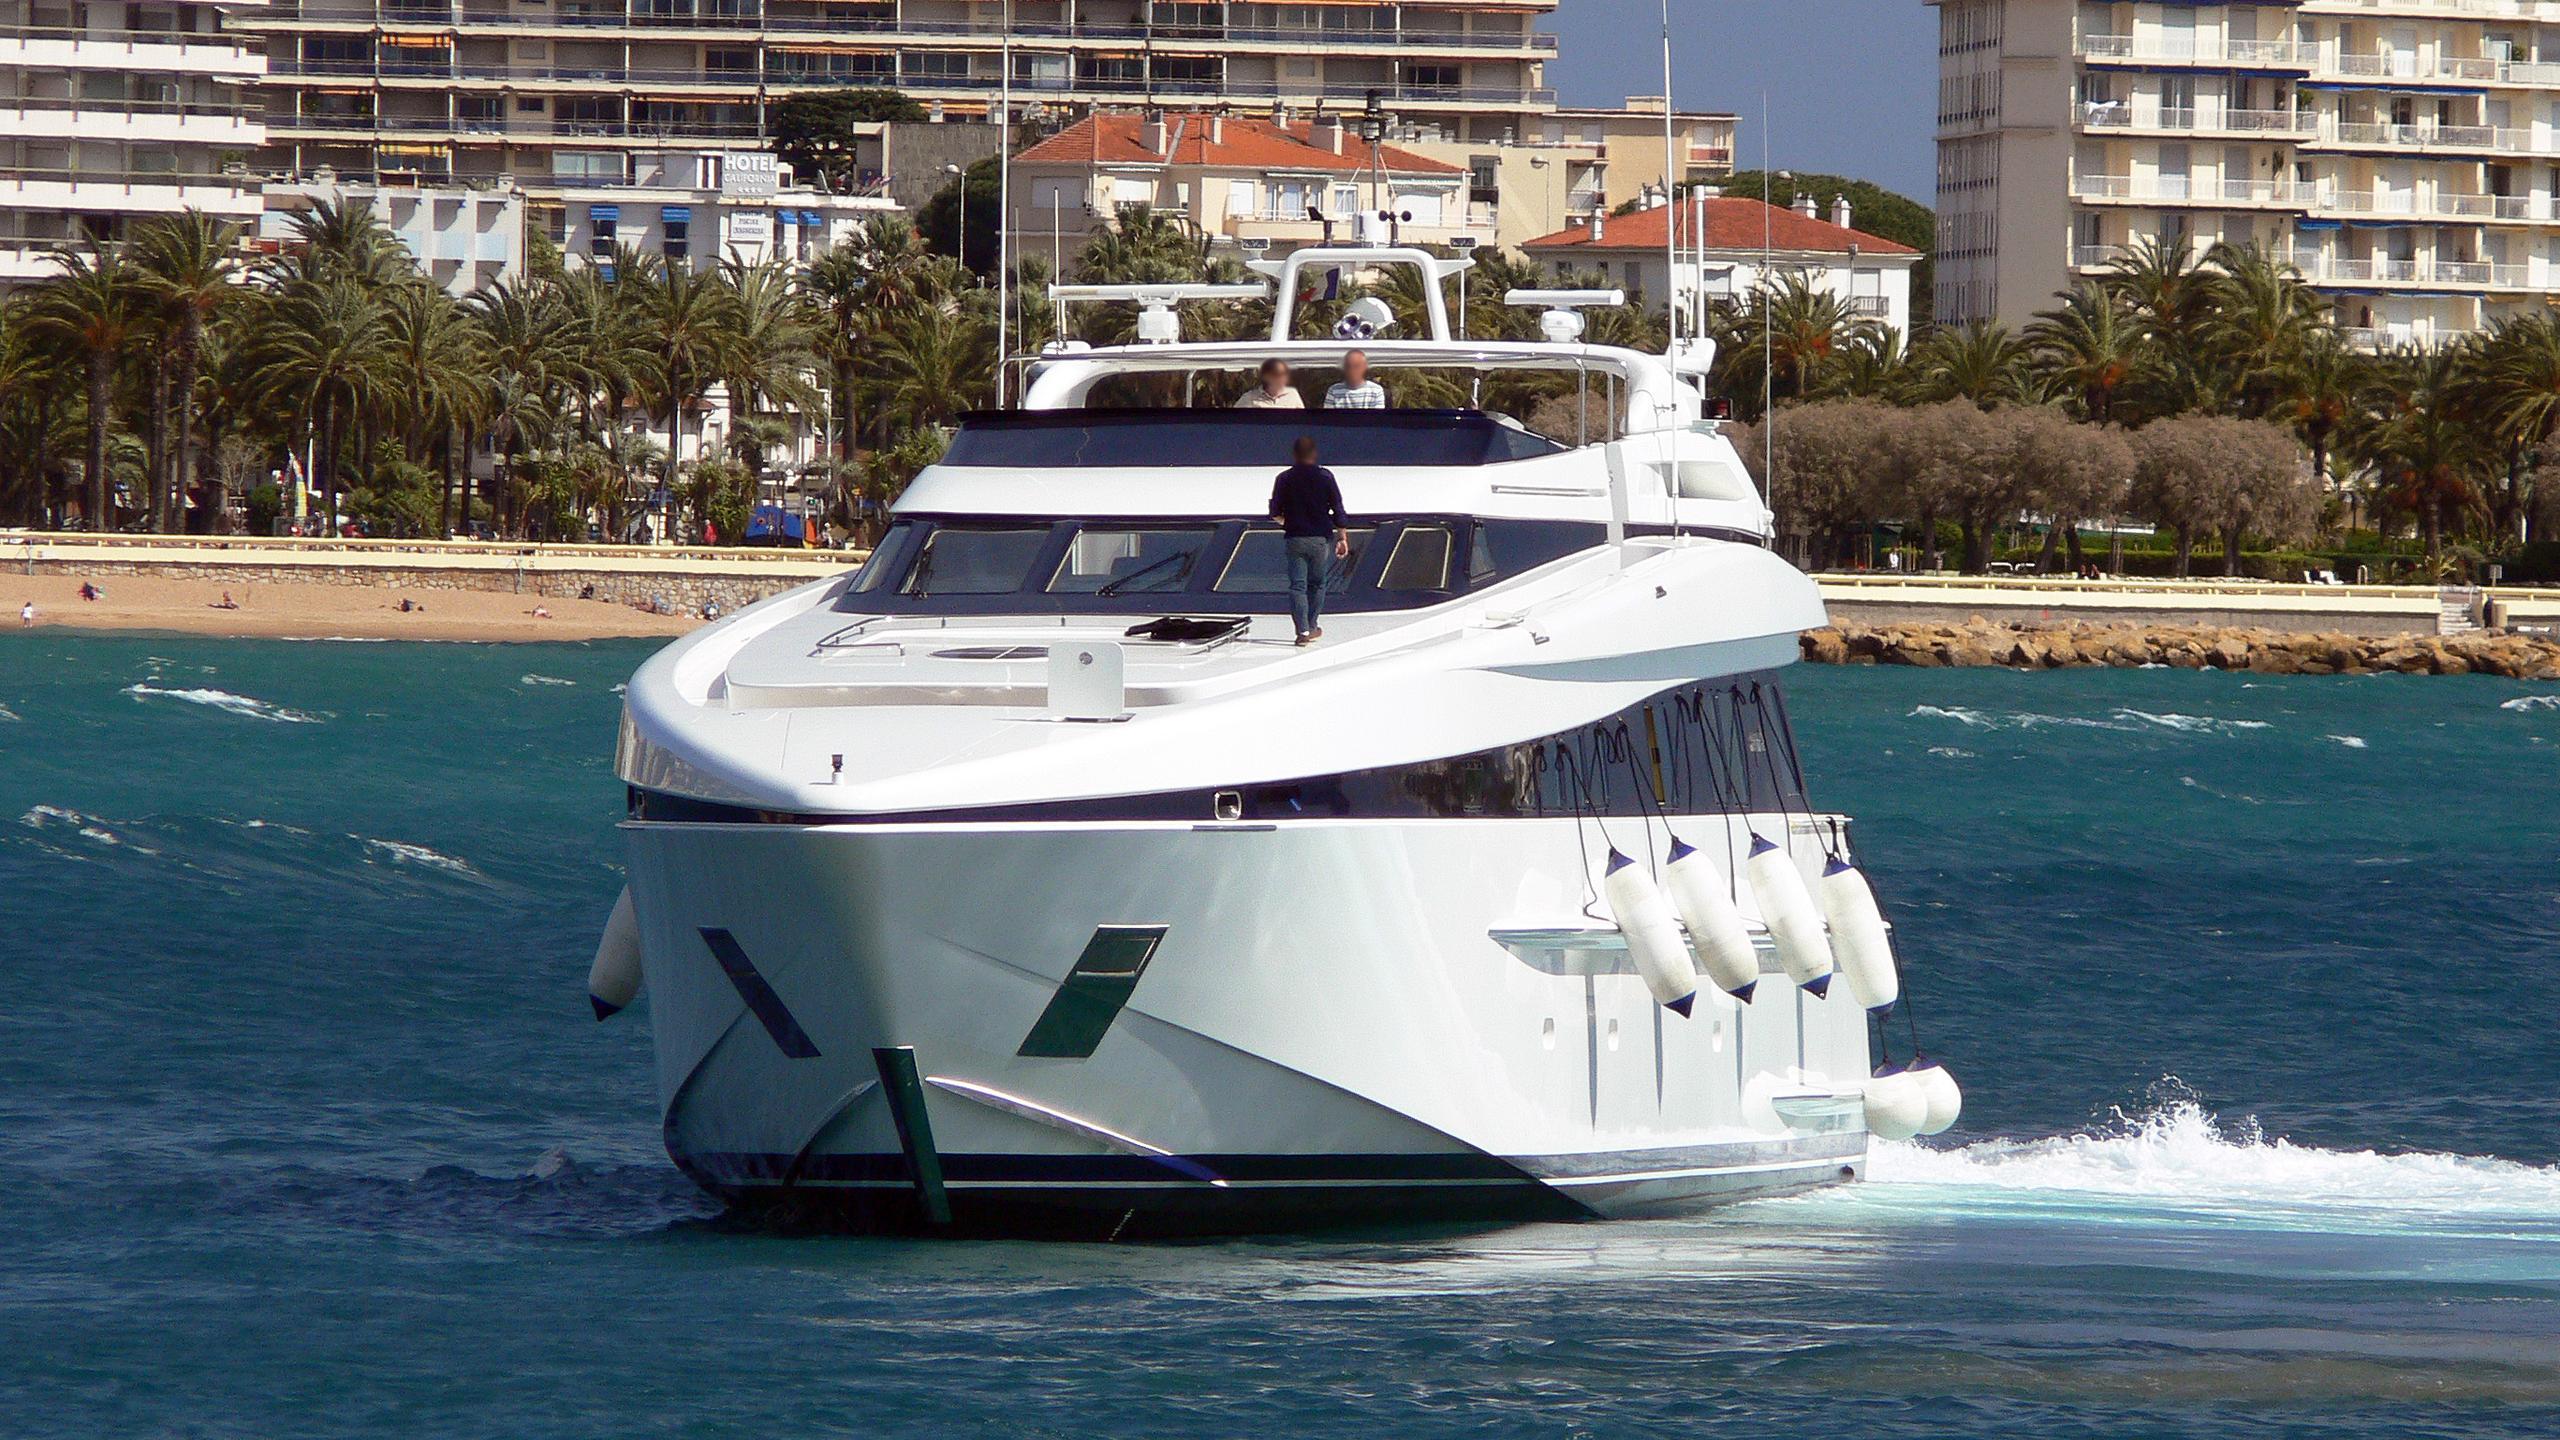 opus-ii-motor-yacht-heesen-1997-36m-bow